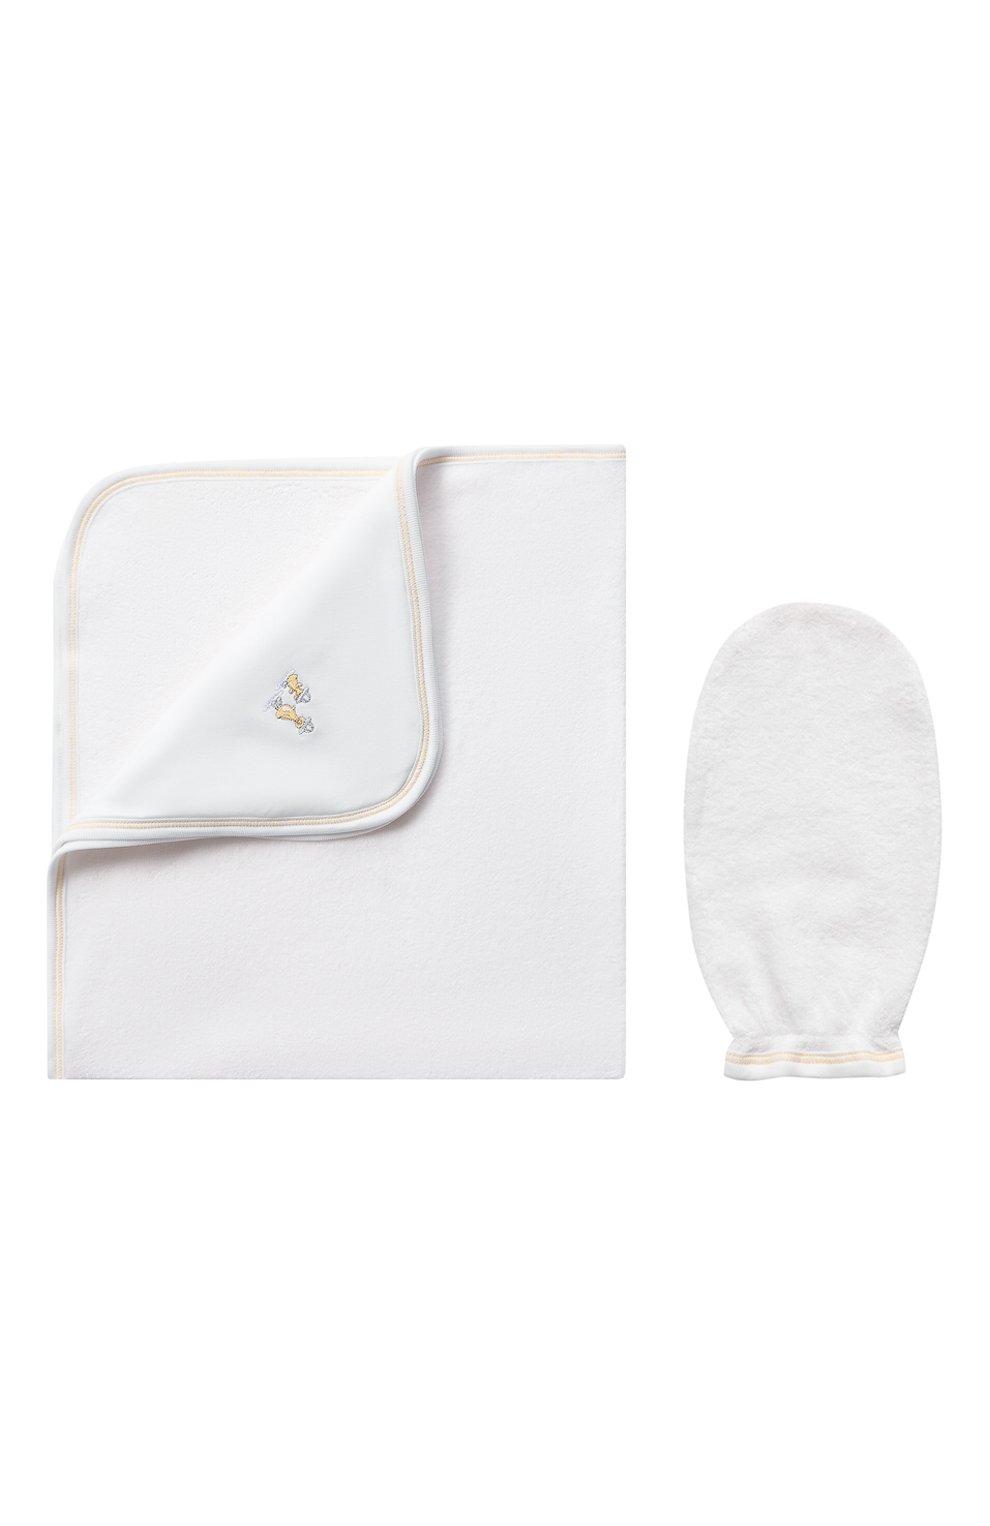 Детского комплект из полотенца и рукавицы KISSY KISSY белого цвета, арт. KN403463O | Фото 1 (Материал: Текстиль, Хлопок)